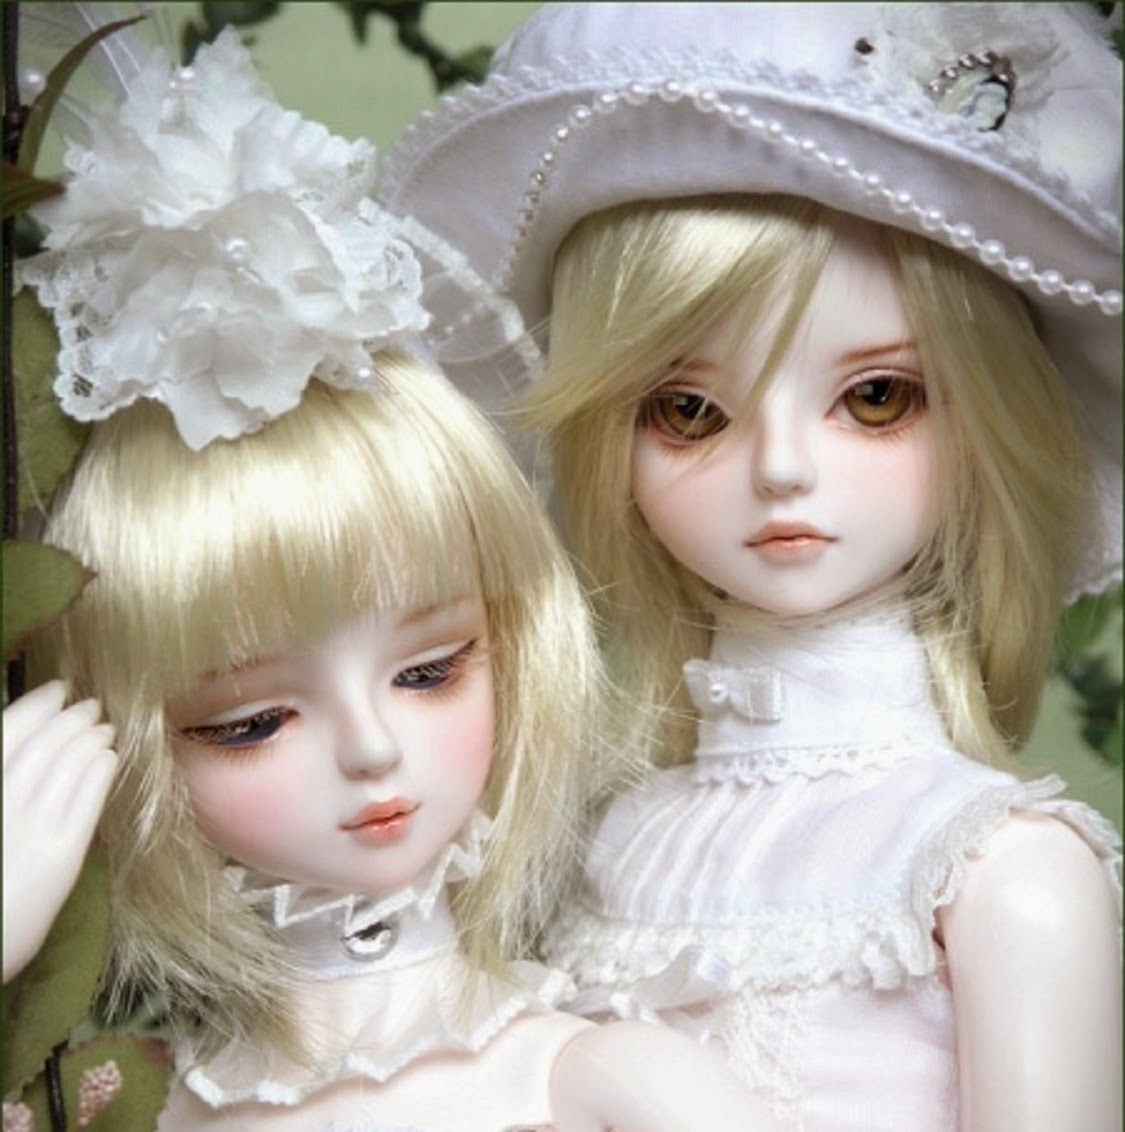 Pin By Sinthiya Afrin On Moja Wielka Pasja Lalki Barbie Cartoon Barbie Dolls Barbie Images